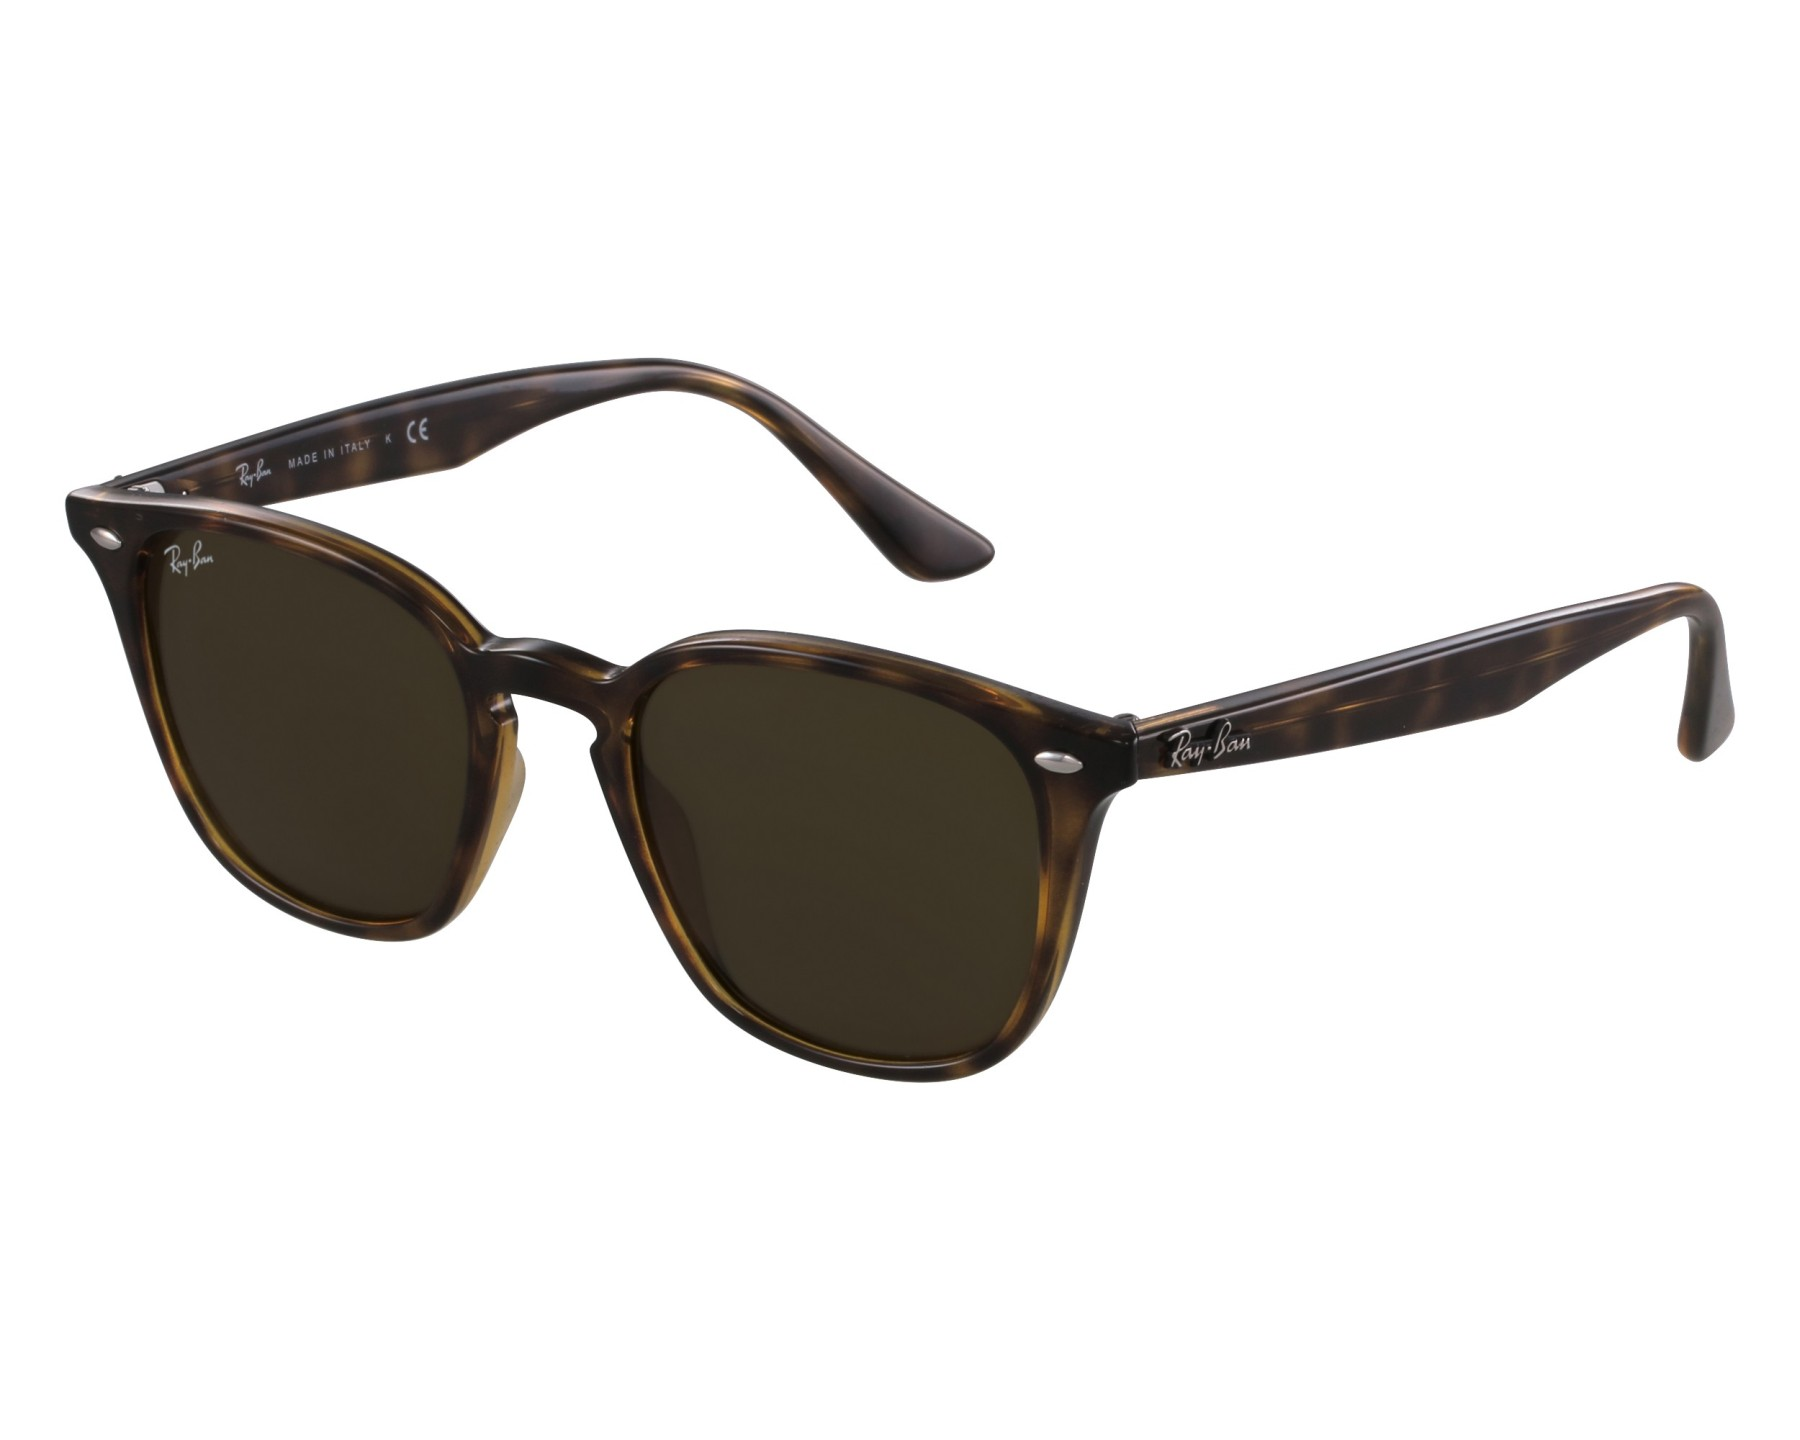 e0d998390d Sunglasses Ray-Ban RB-4258 710 73 50-20 Havana front view